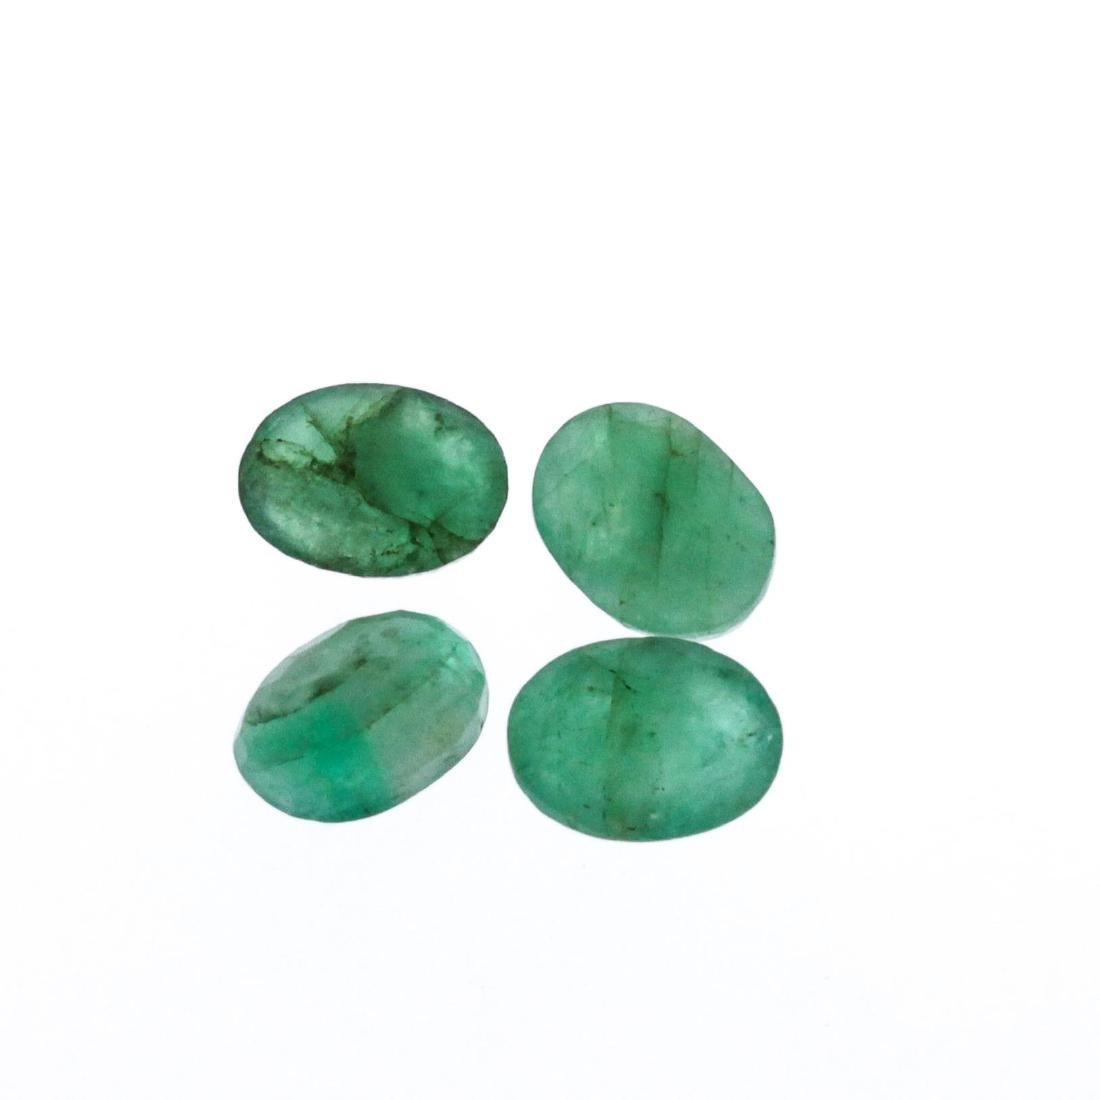 4.47 cts. Oval Cut Natural Emerald Parcel